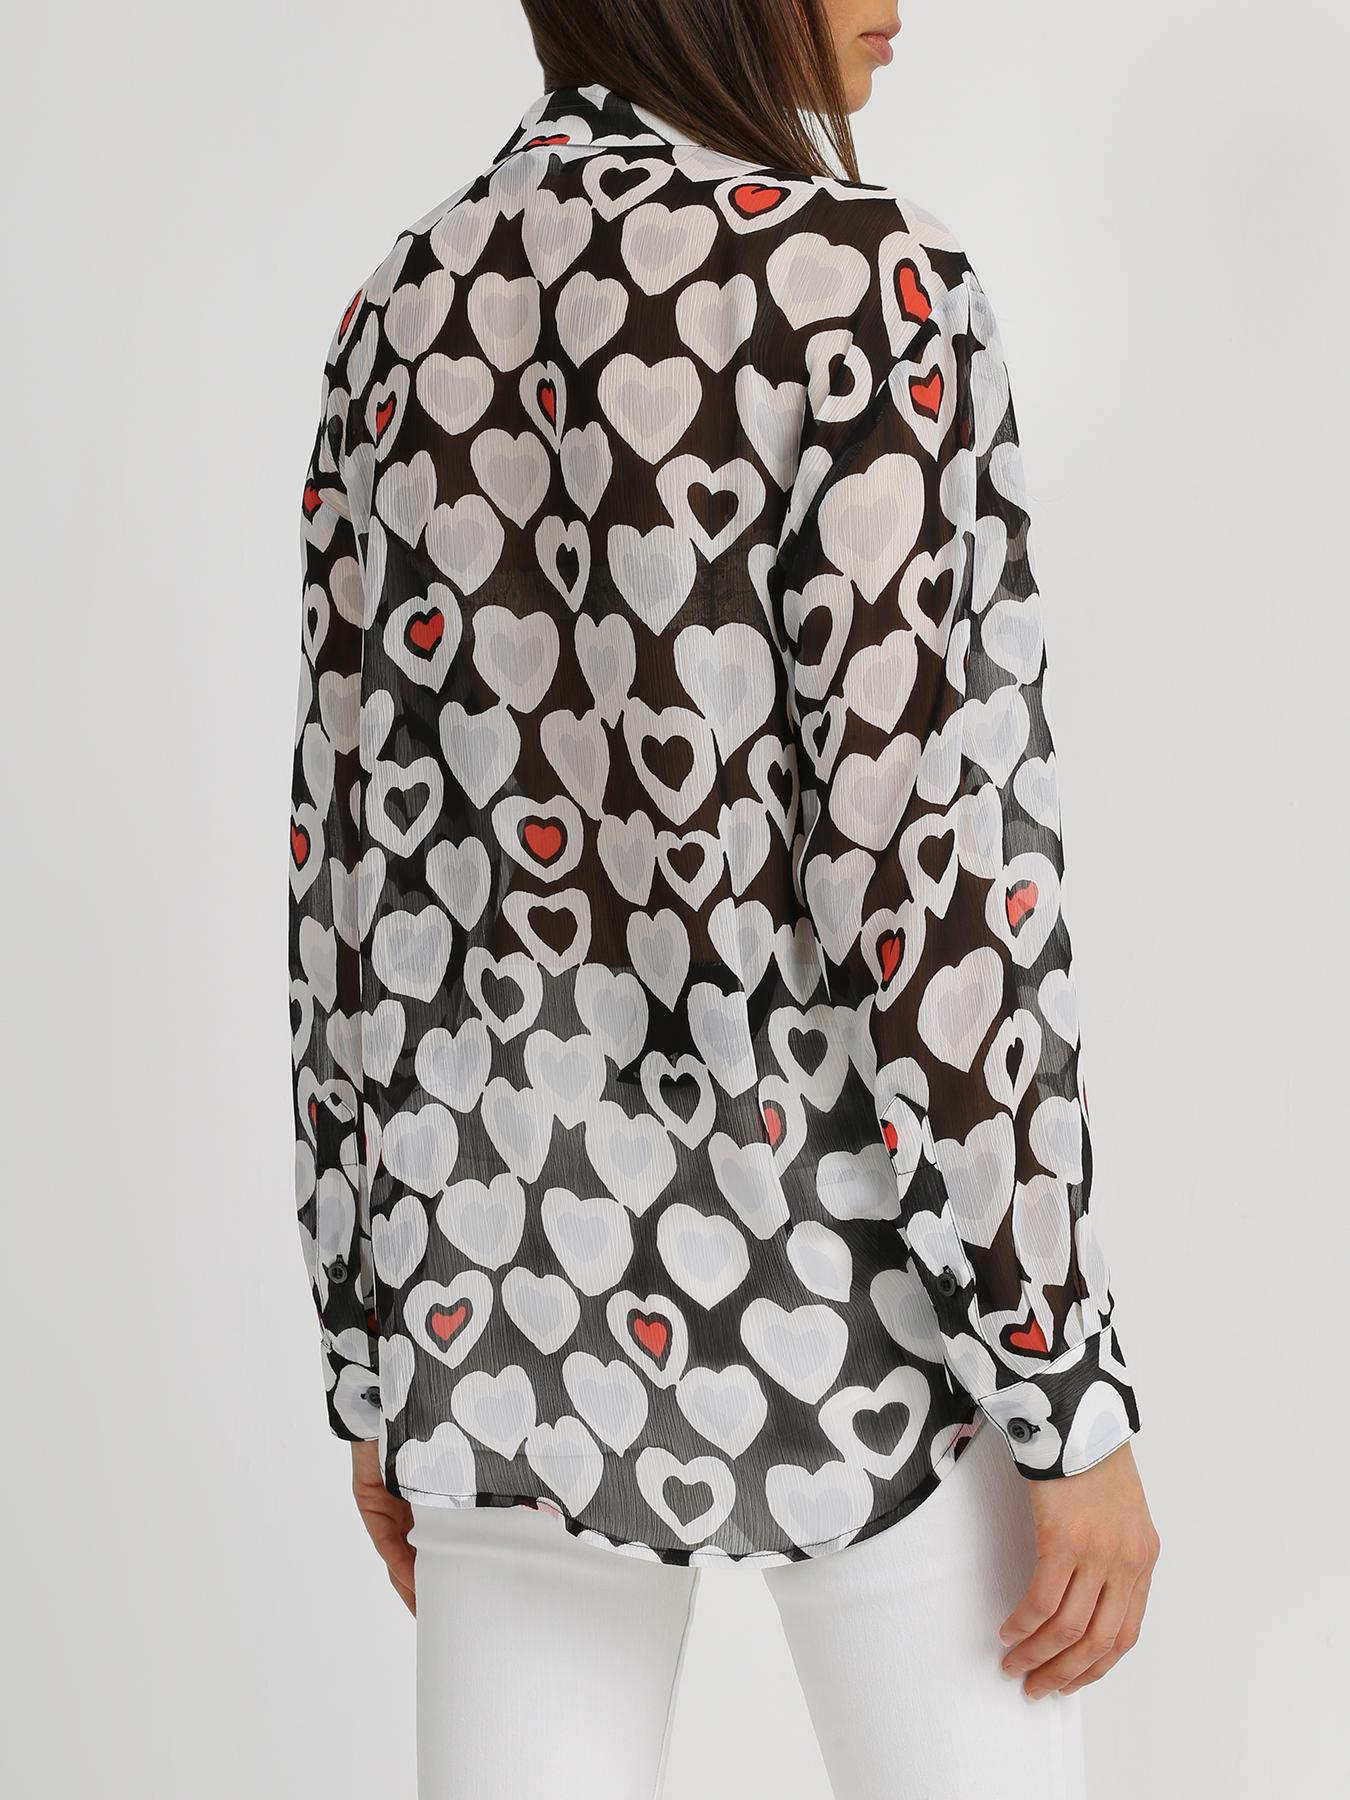 Emporio Armani Рубашка с сердечками 339017-024 Фото 2